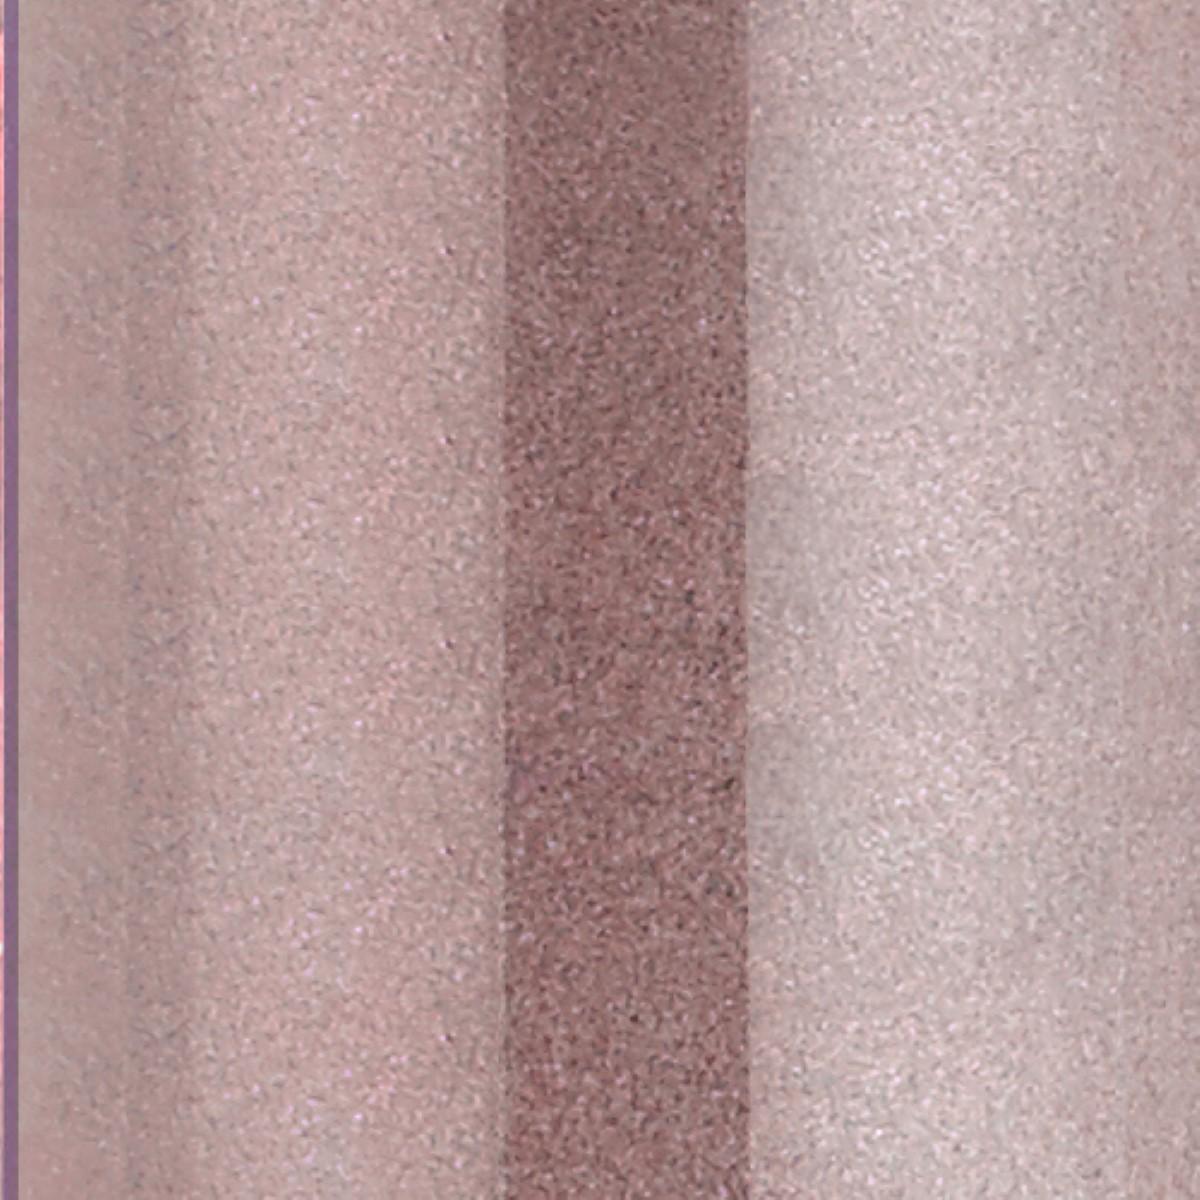 44350040perfecteyepowdershinyrosecolordotmaluwilz